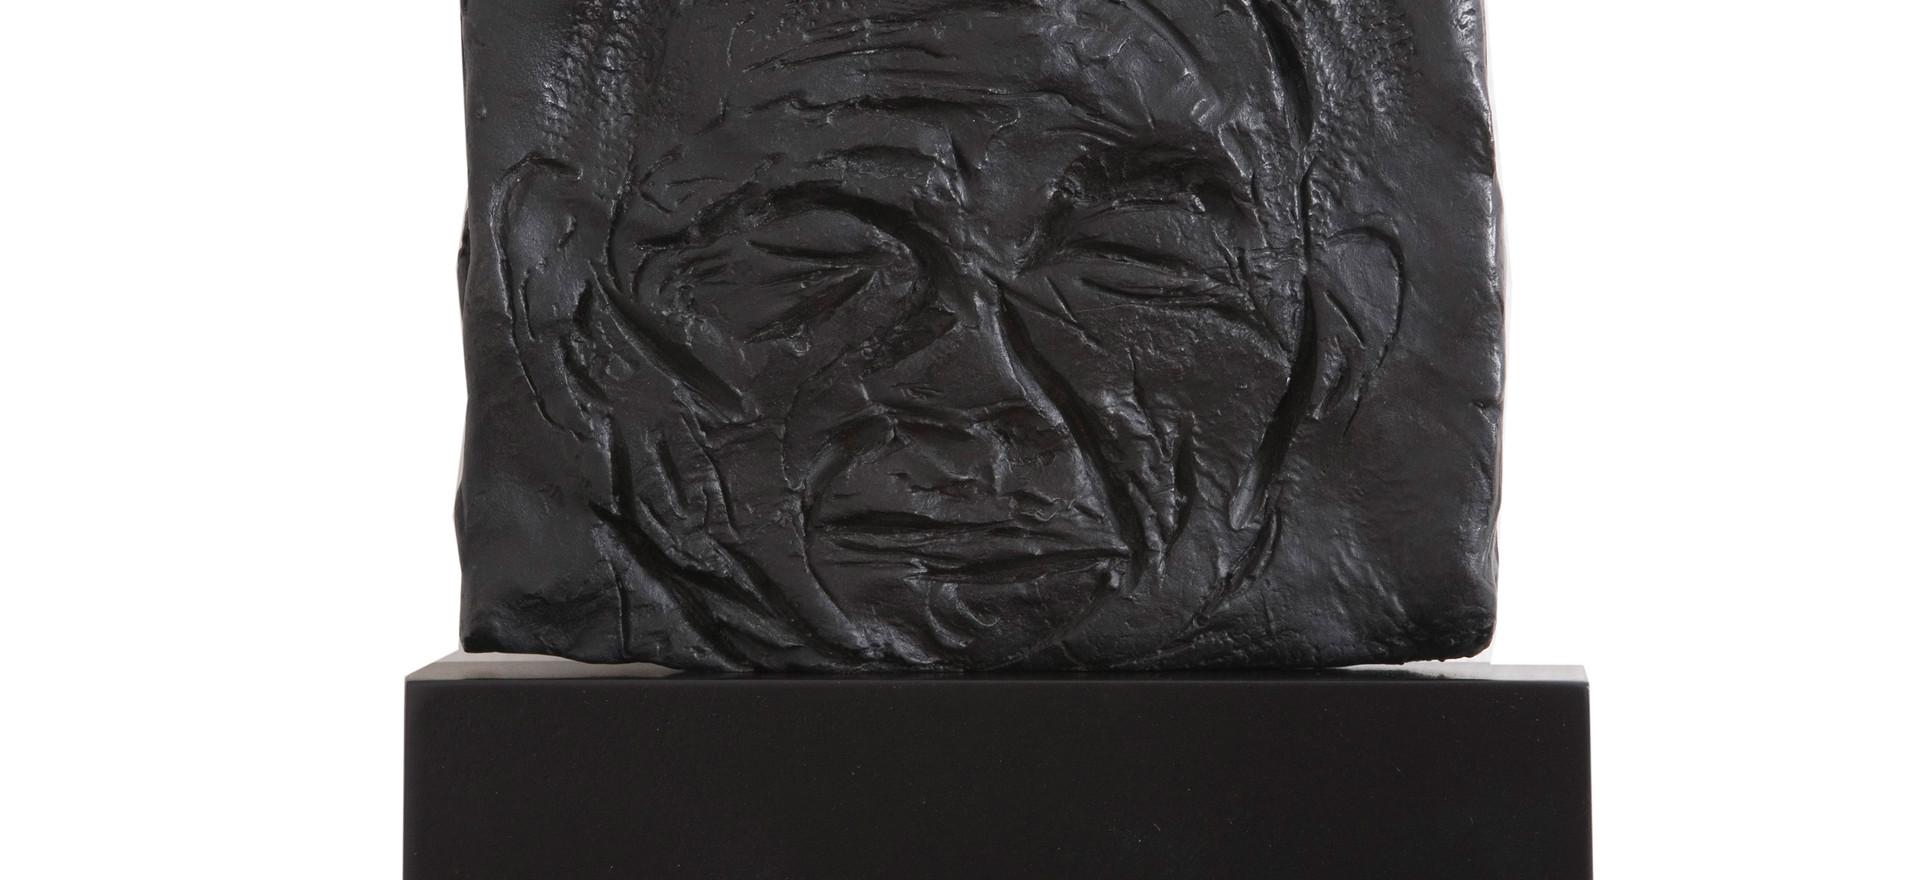 'Pyro II', 2004, bronze, 11 x 13 x 2 cm